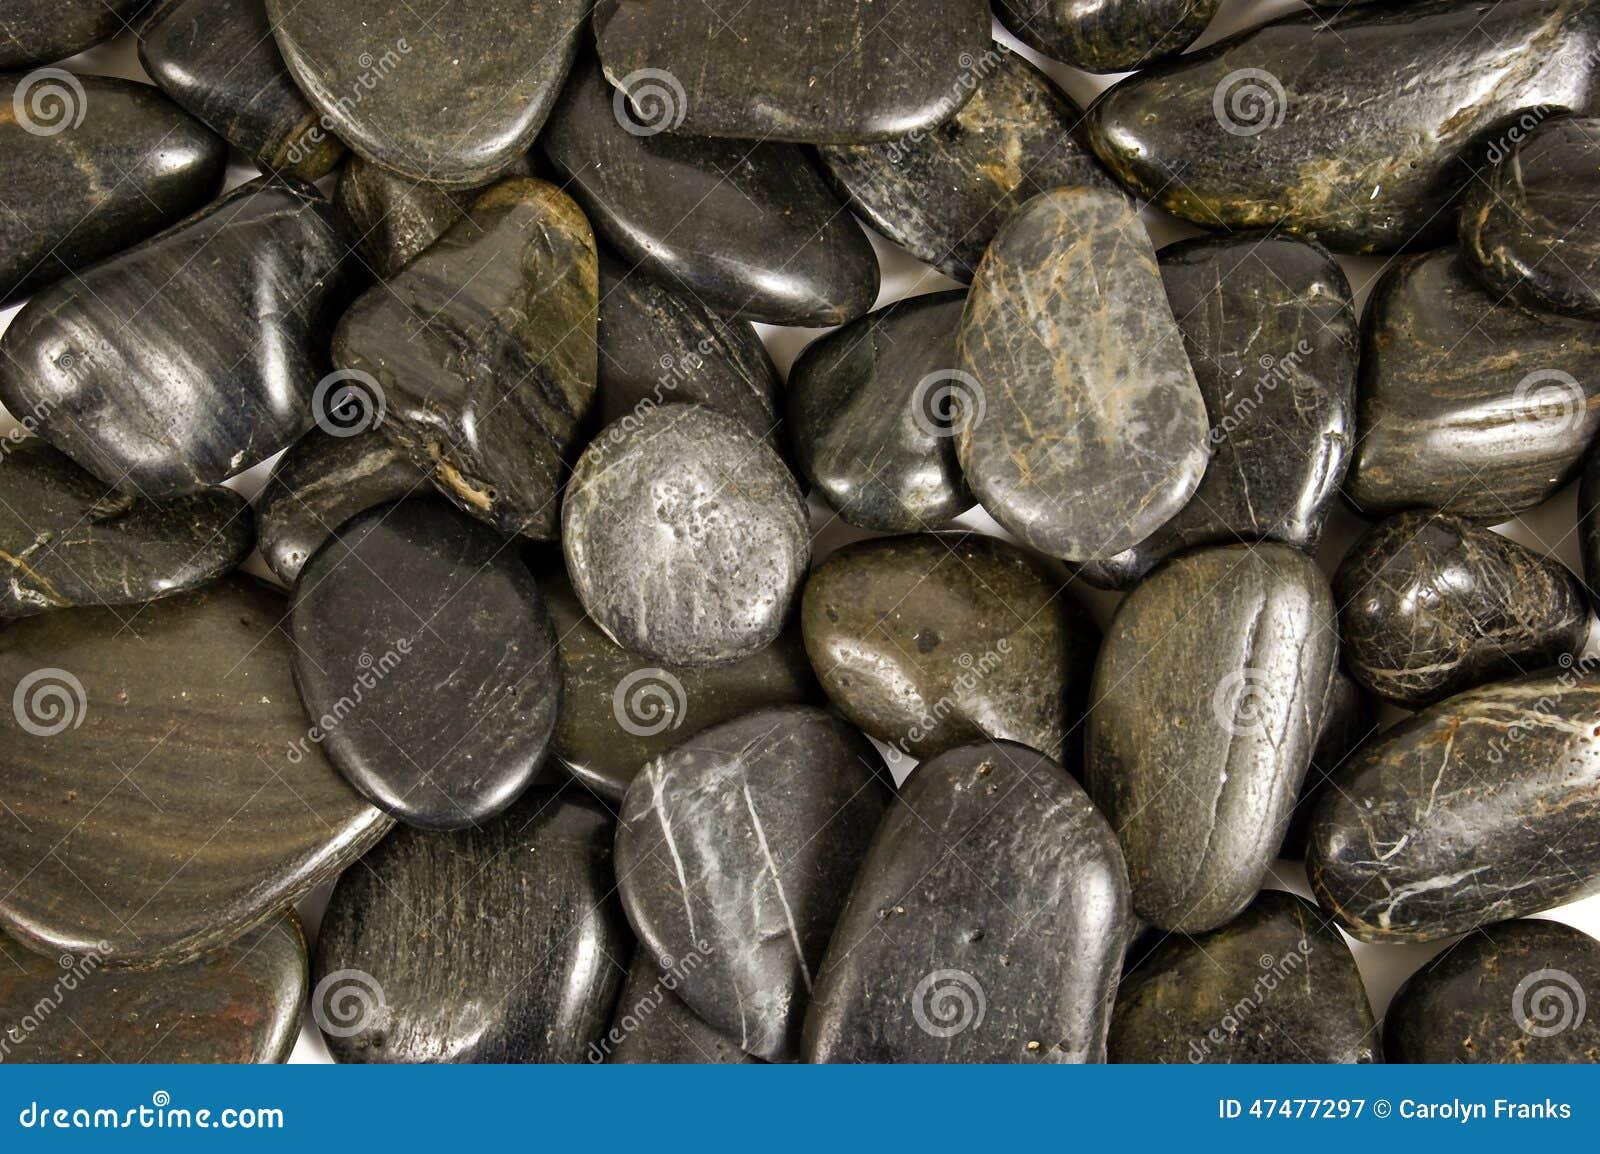 Shiny river rocks or stone background stock photo image for Shiny black granite rocks